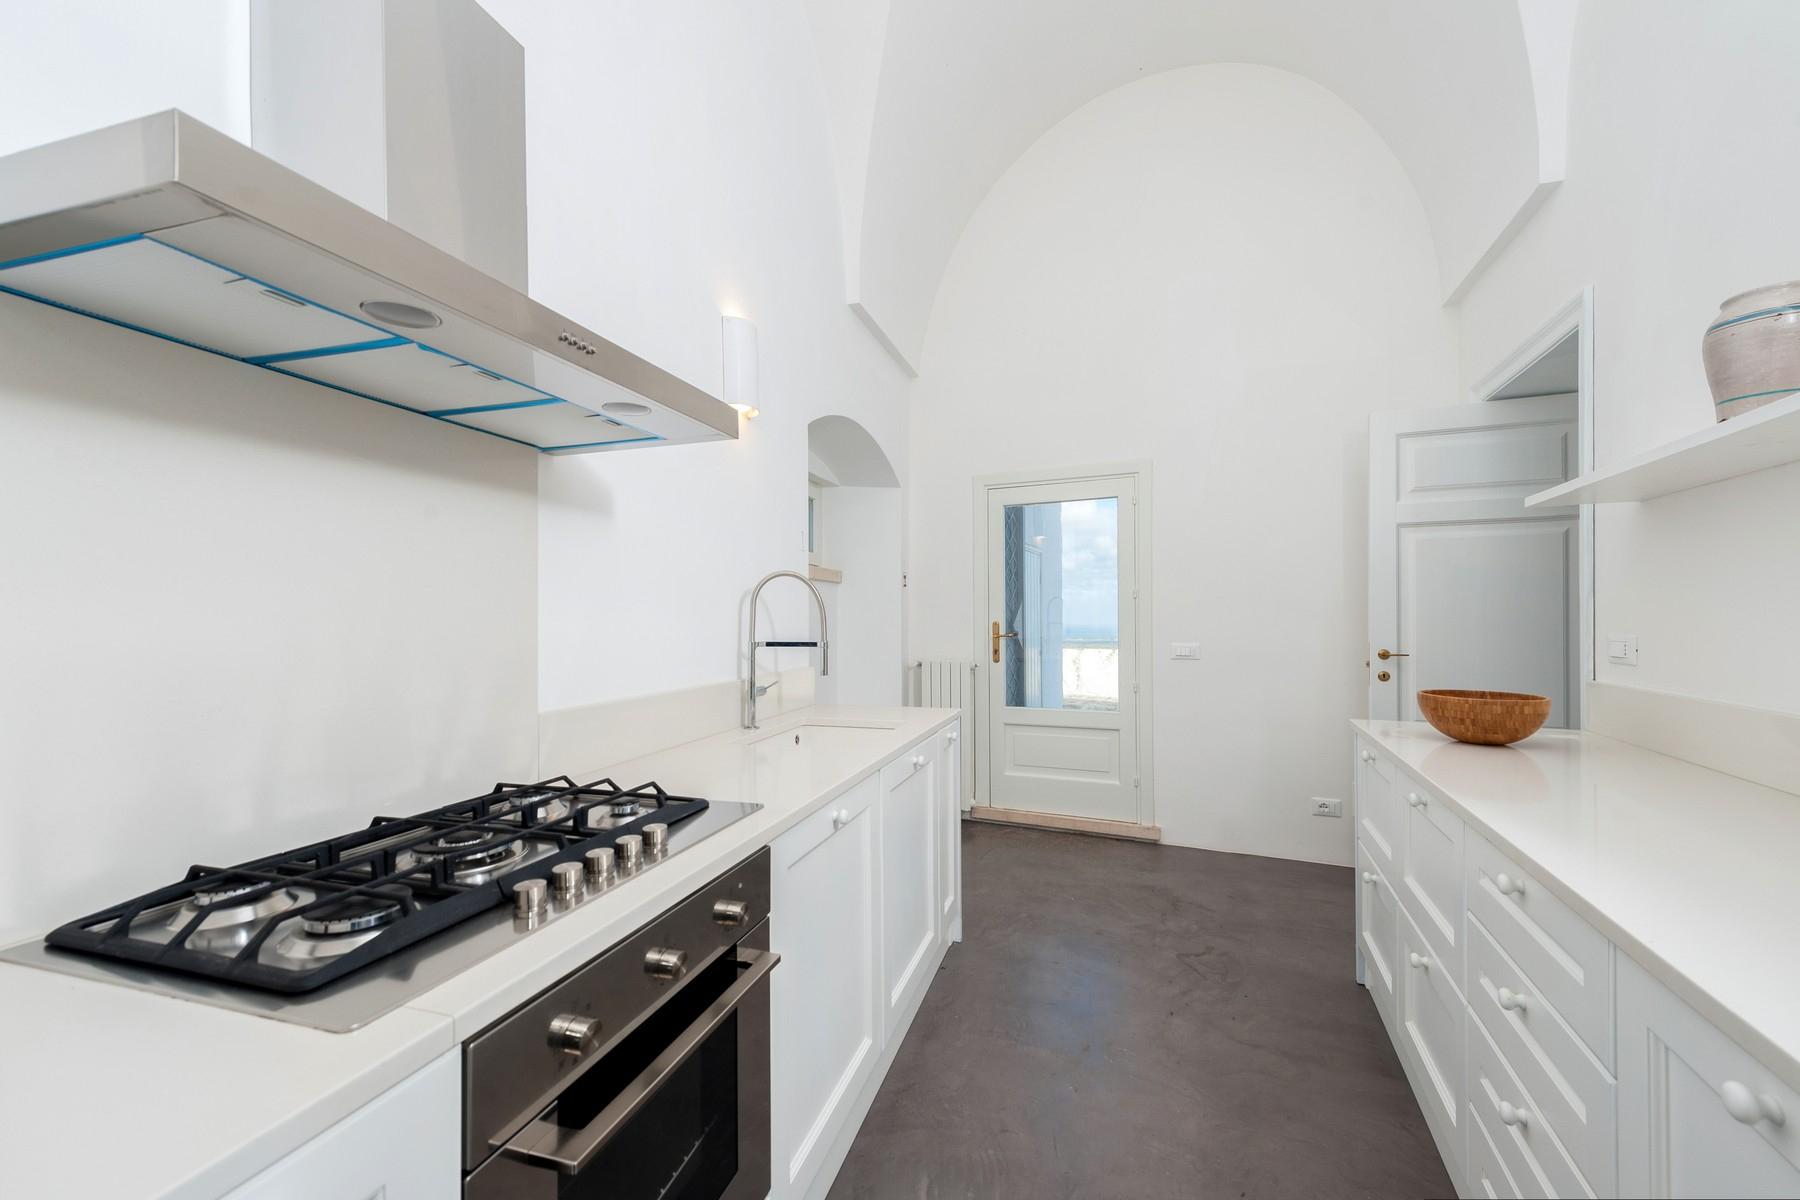 Appartamento in Vendita a Ostuni: 5 locali, 265 mq - Foto 7